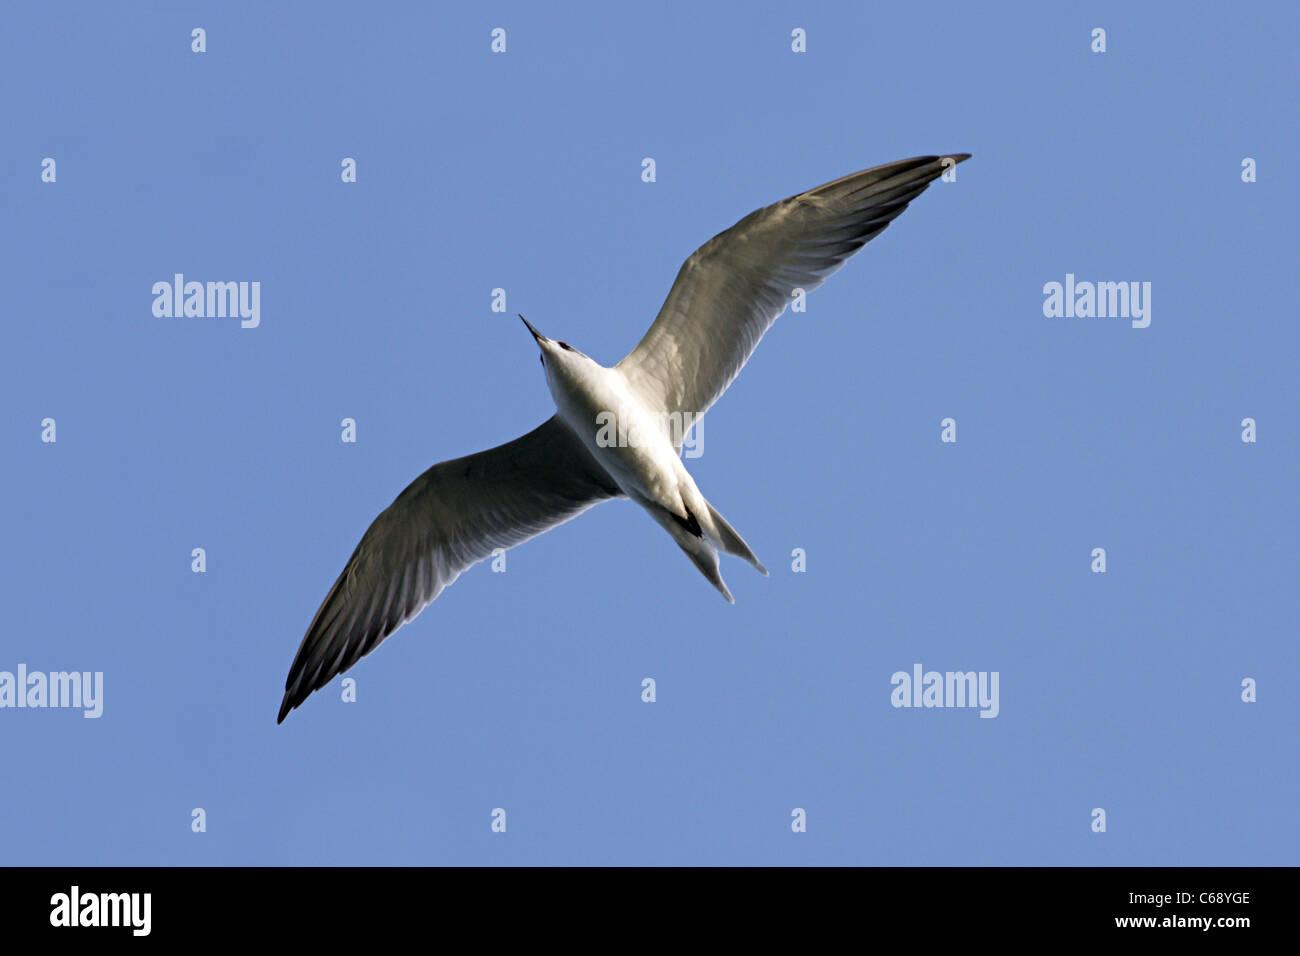 Gull-billed Tern, 1st winter (Gelochelidon nilotica) At, Lakhota lake, Jamnagar, Gujarat - Stock Image